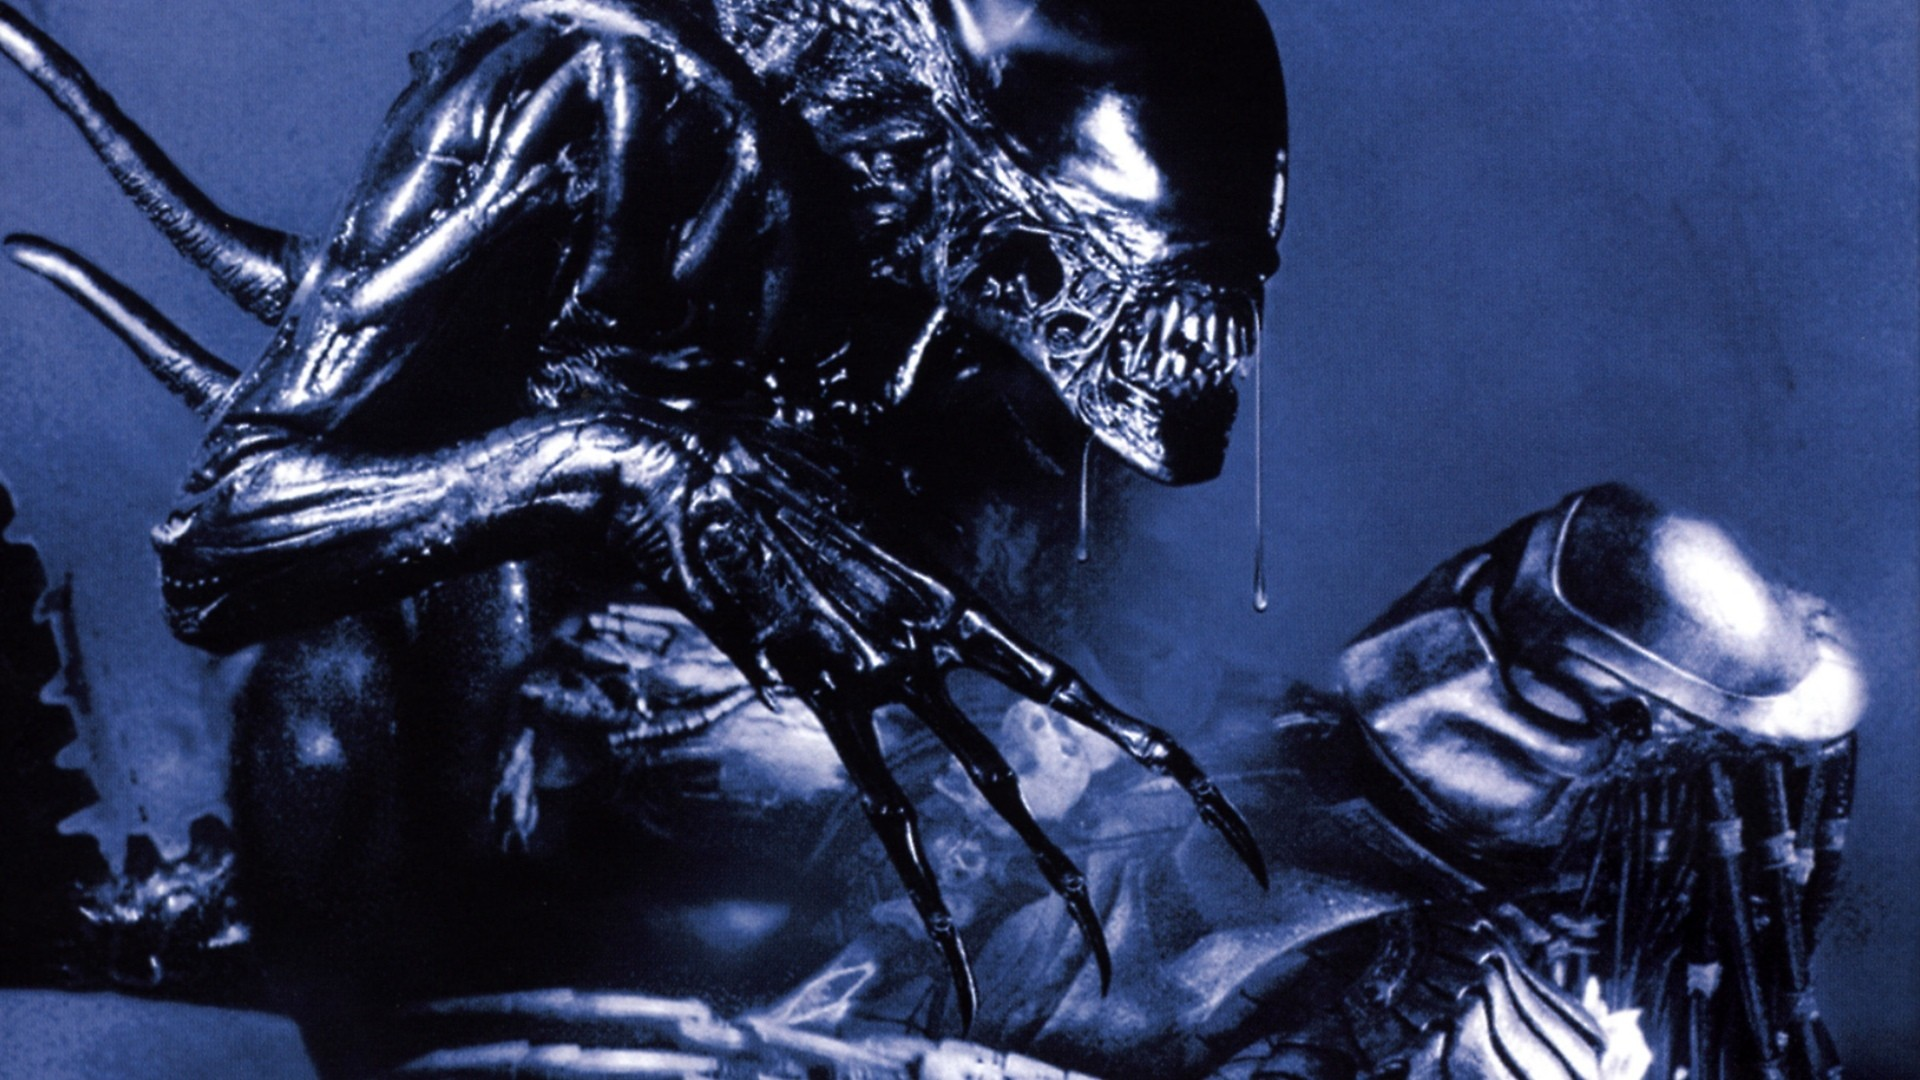 alien vs predator 1 game free download